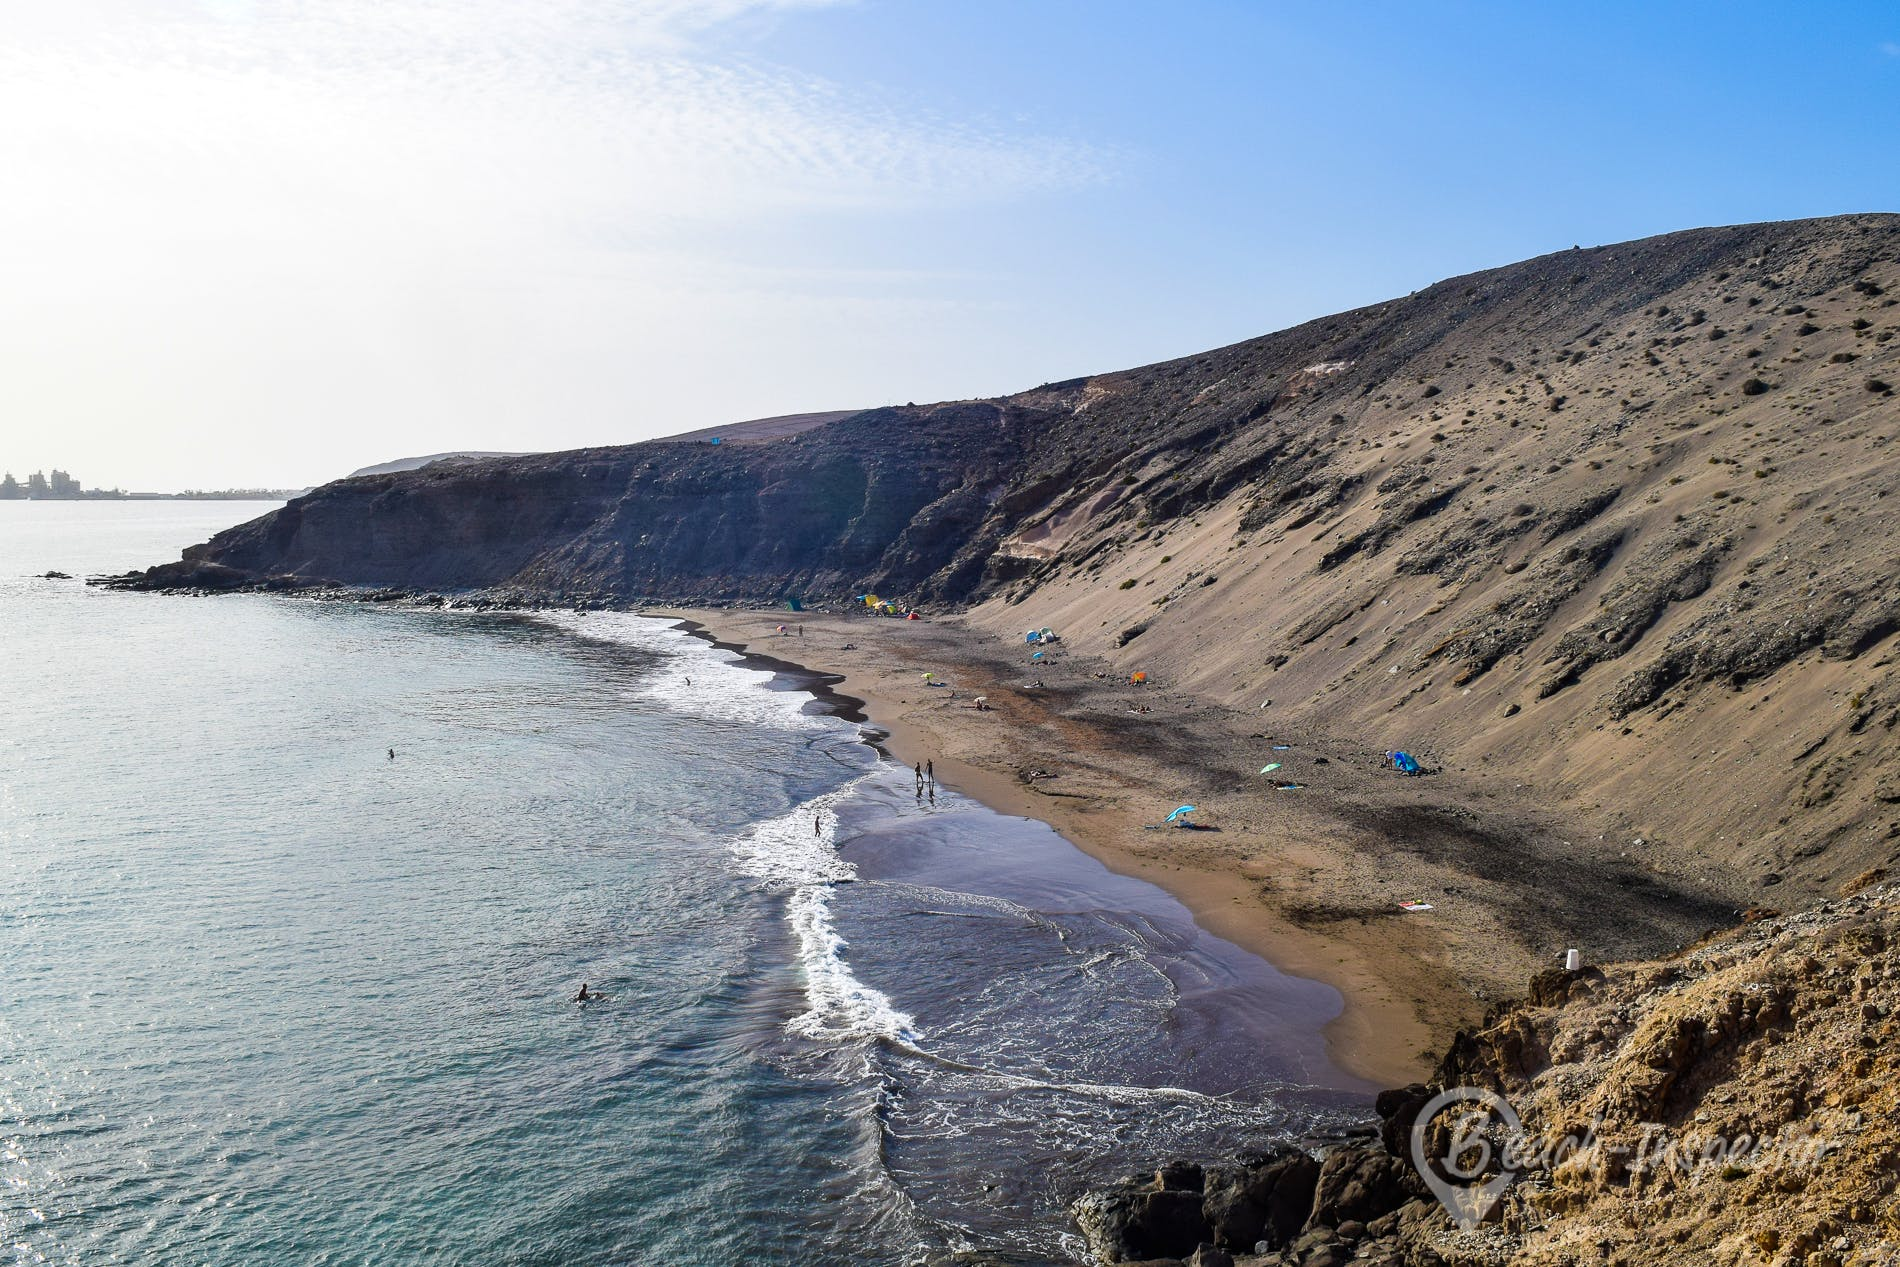 Beach Playa del Cometa, Gran Canaria, Spain